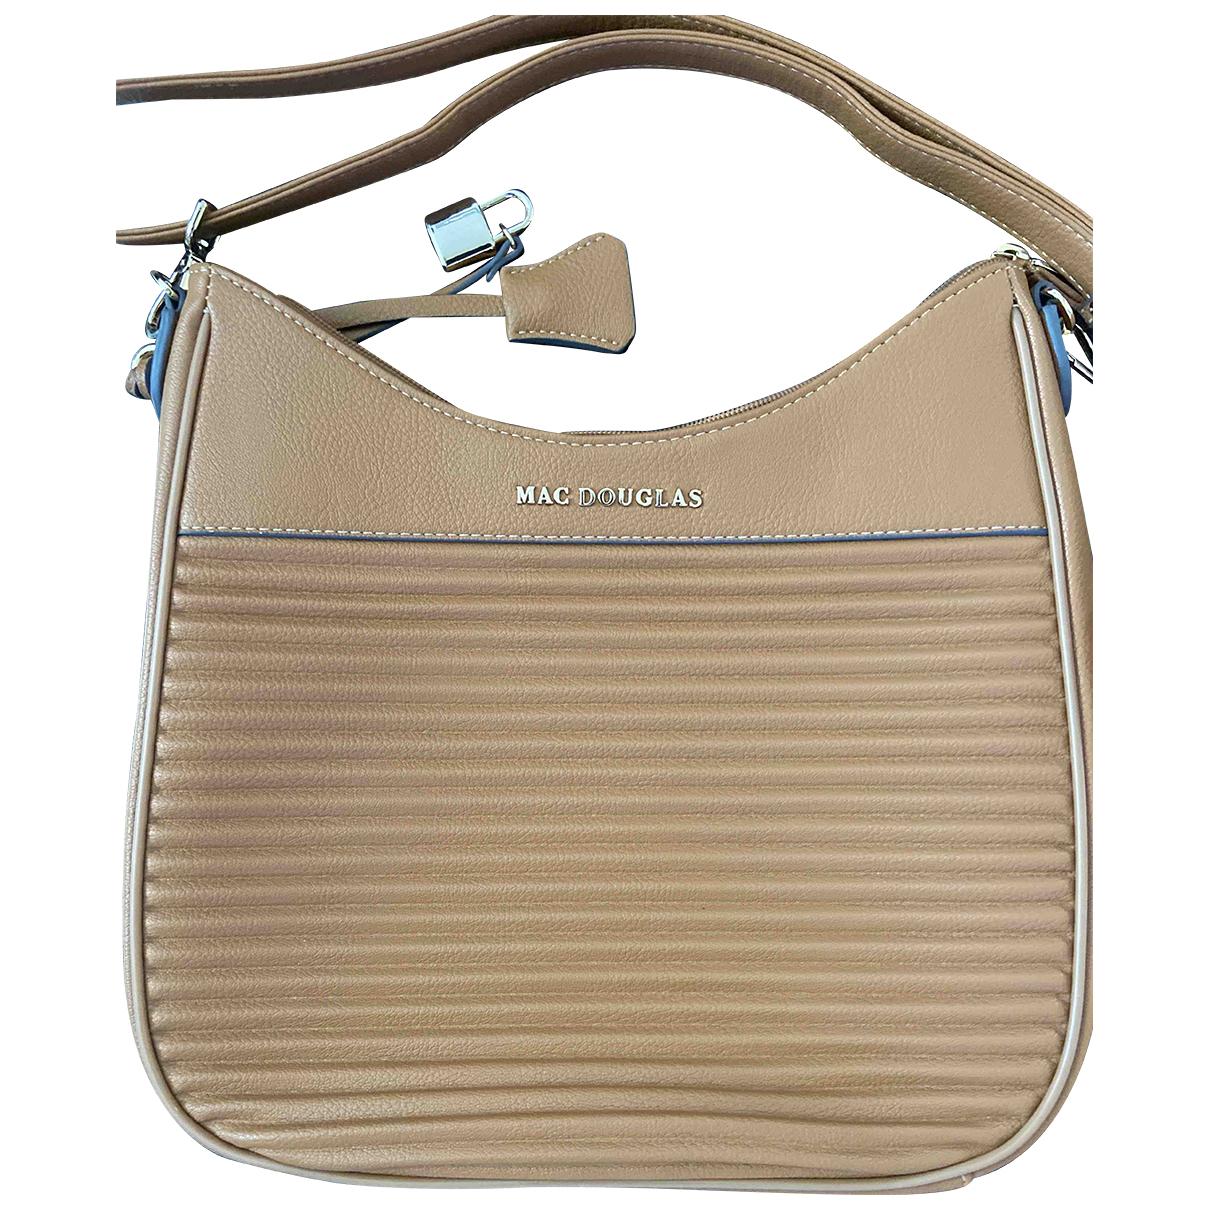 Mac Douglas \N Camel Leather handbag for Women \N